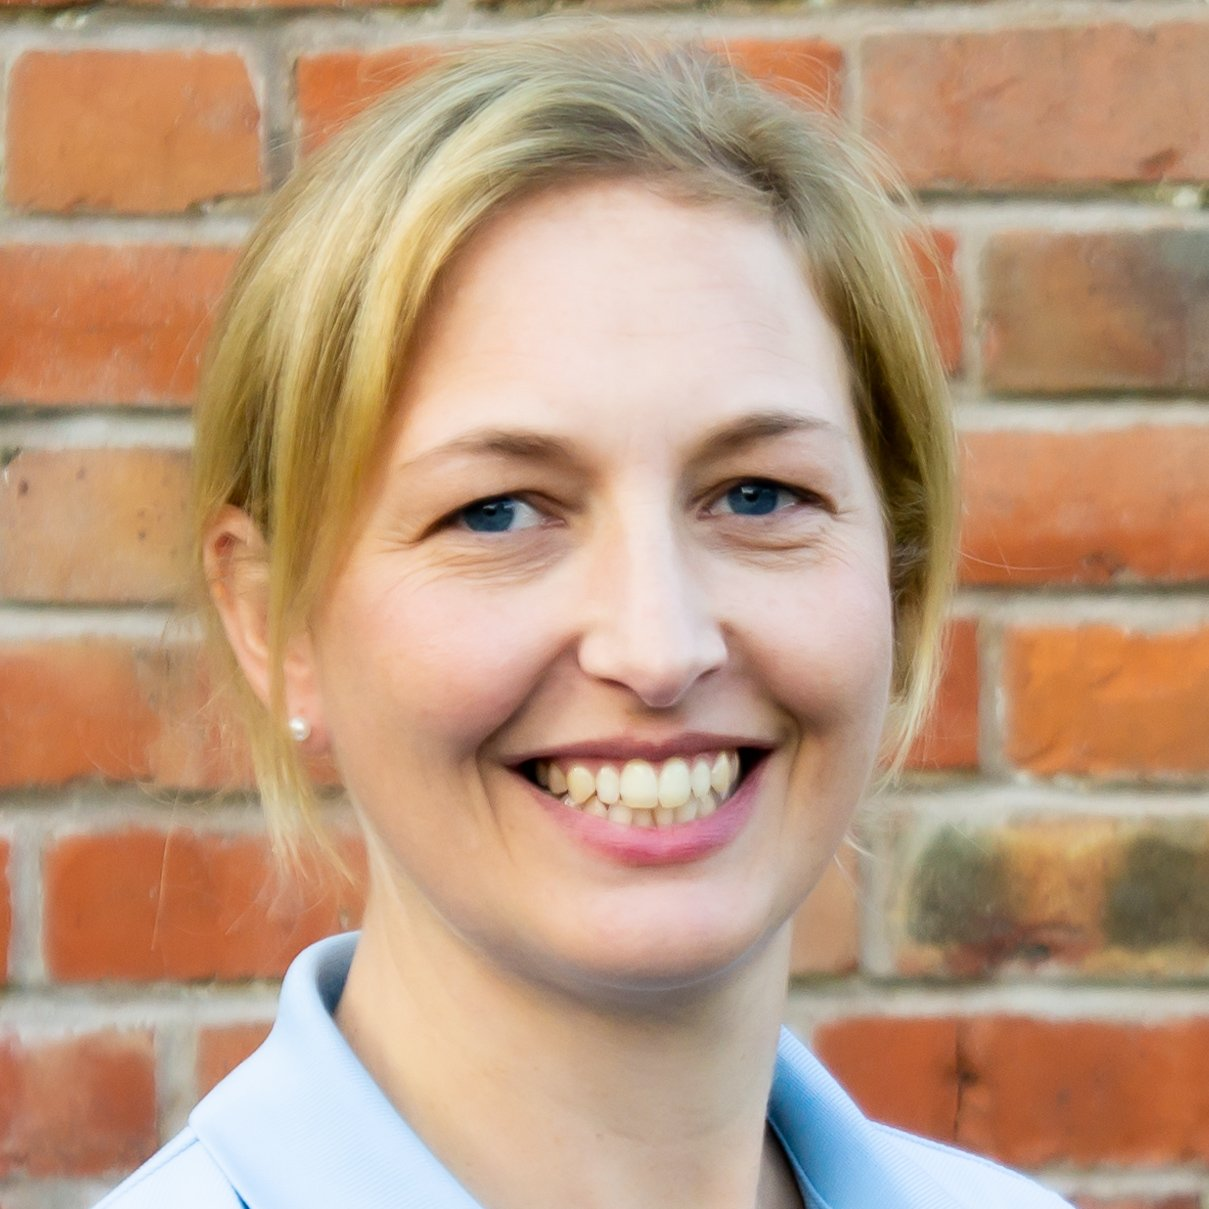 Meet the team - Amanda Freeman-Hicks